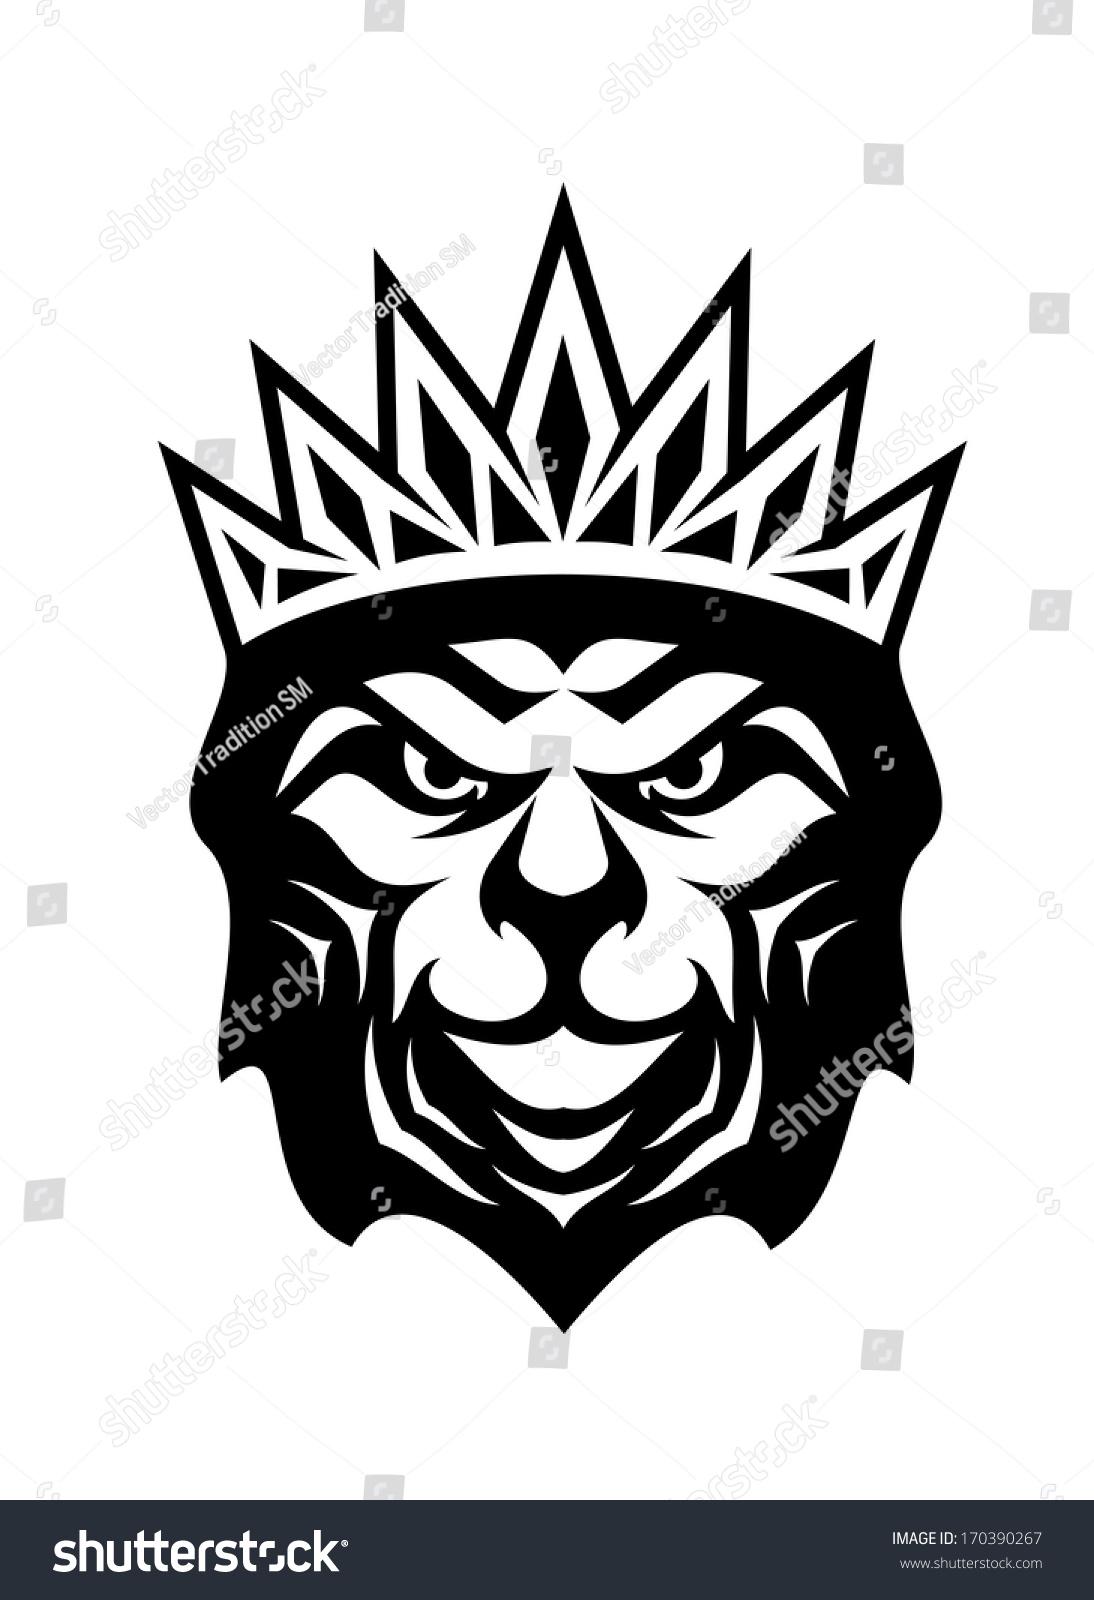 Heraldic Crowned Lion Symbol Royalty King Stock Vector 170390267